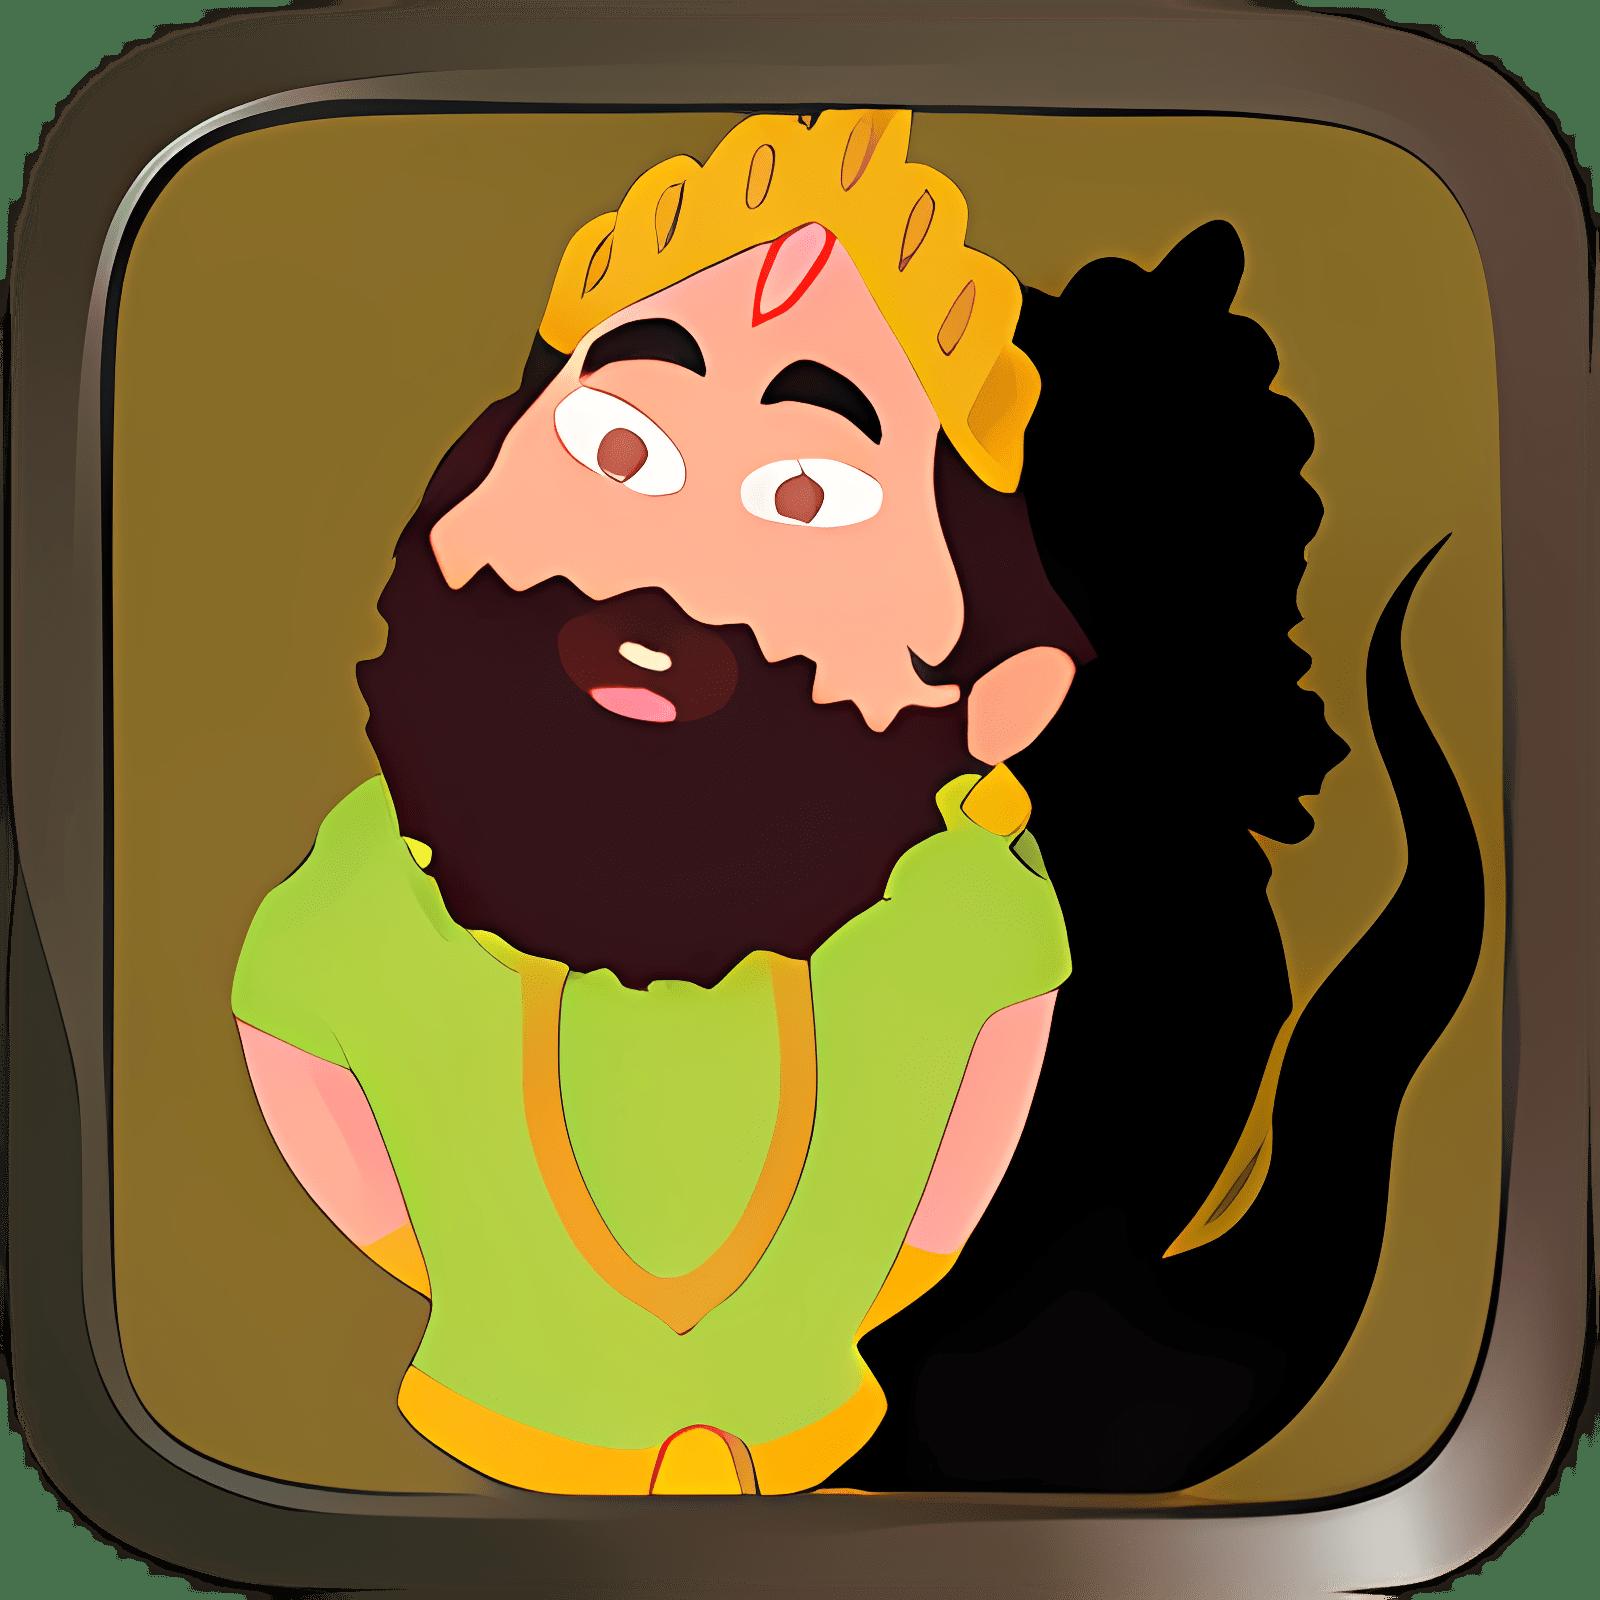 Punjabi Kids Story By Pari 02